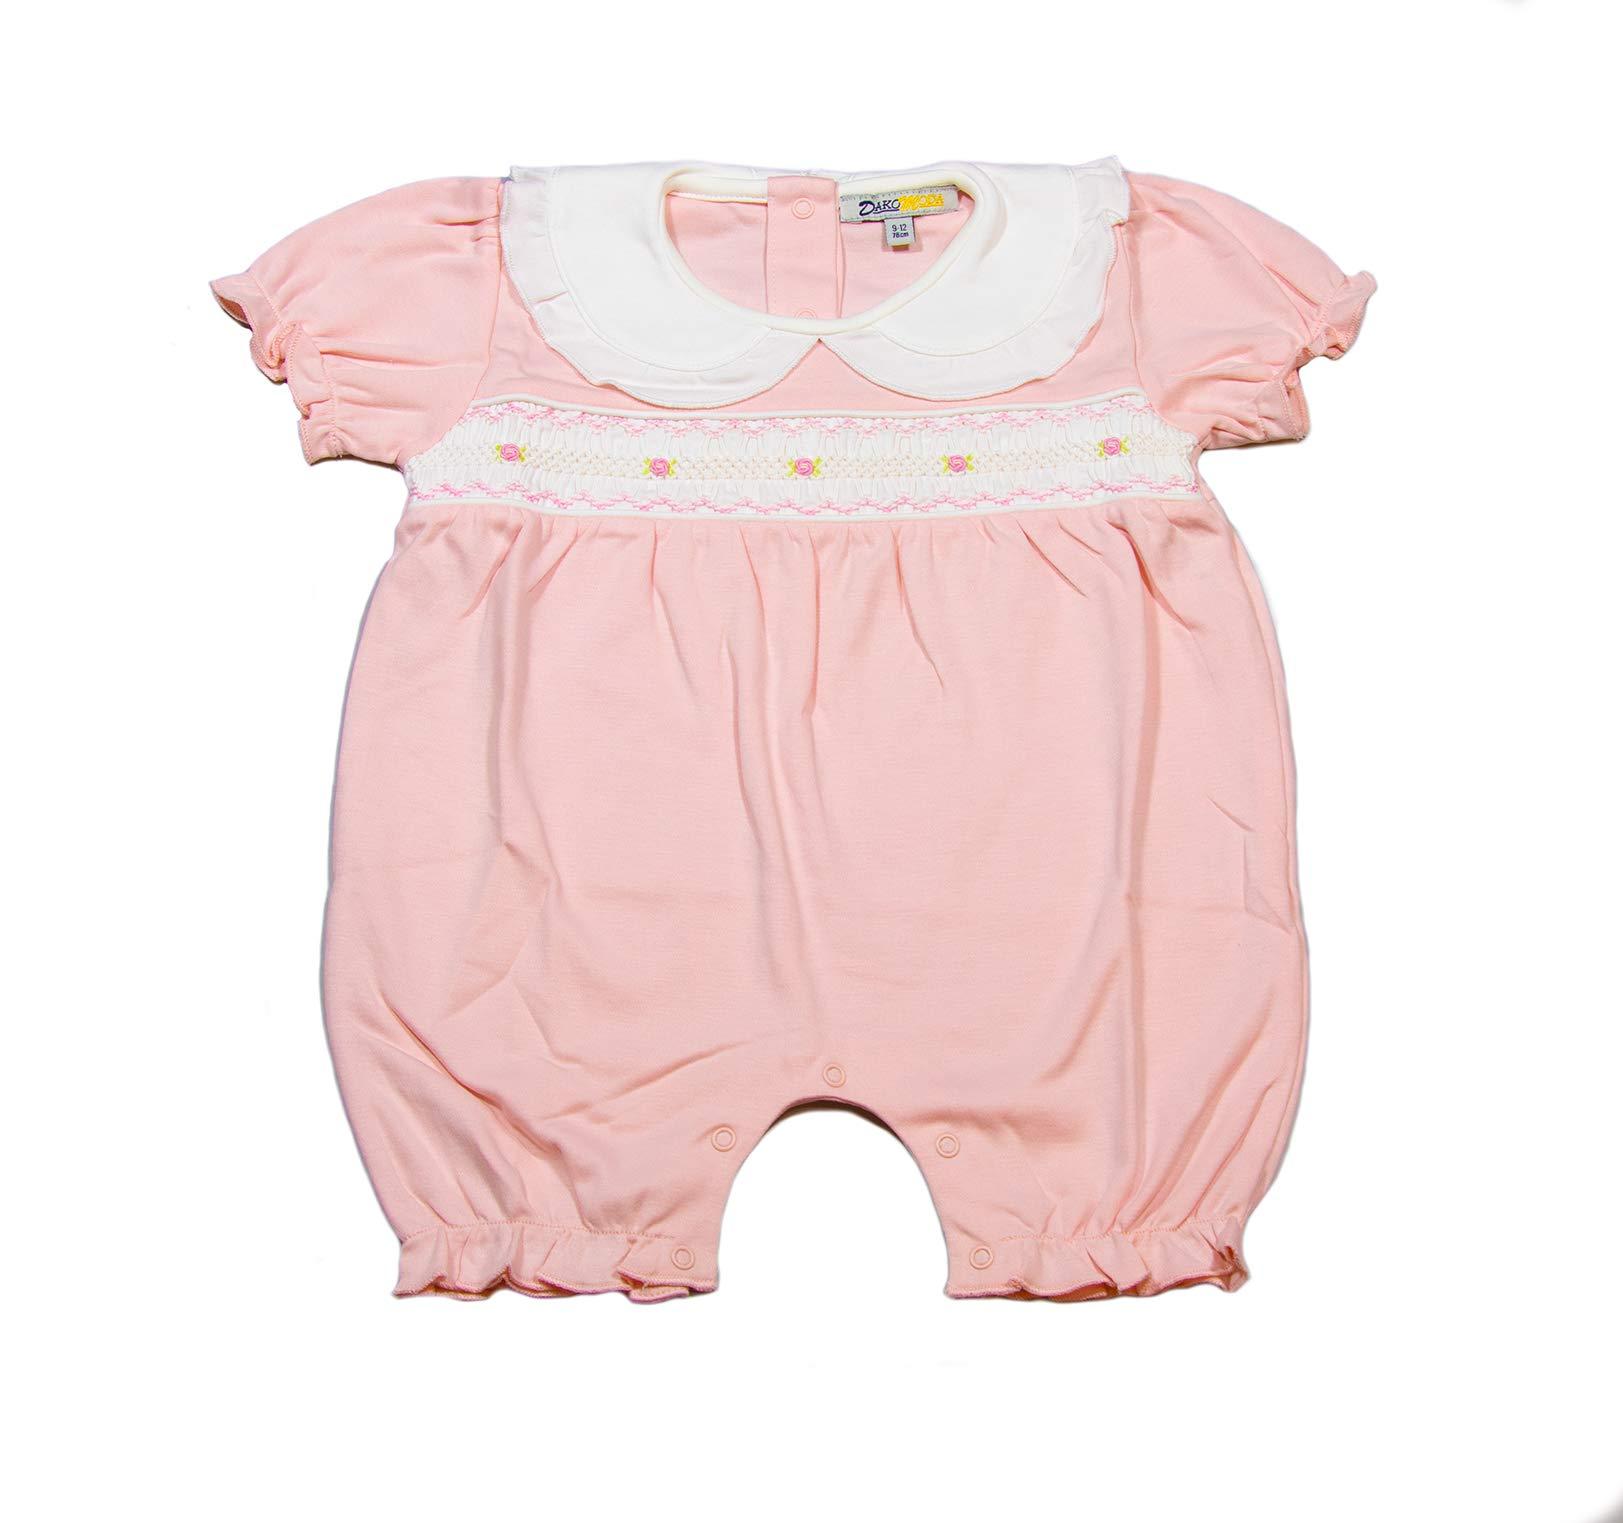 Dakomoda Baby Girls' Organic Smocked Romper, Pink Easter Christening Outfit